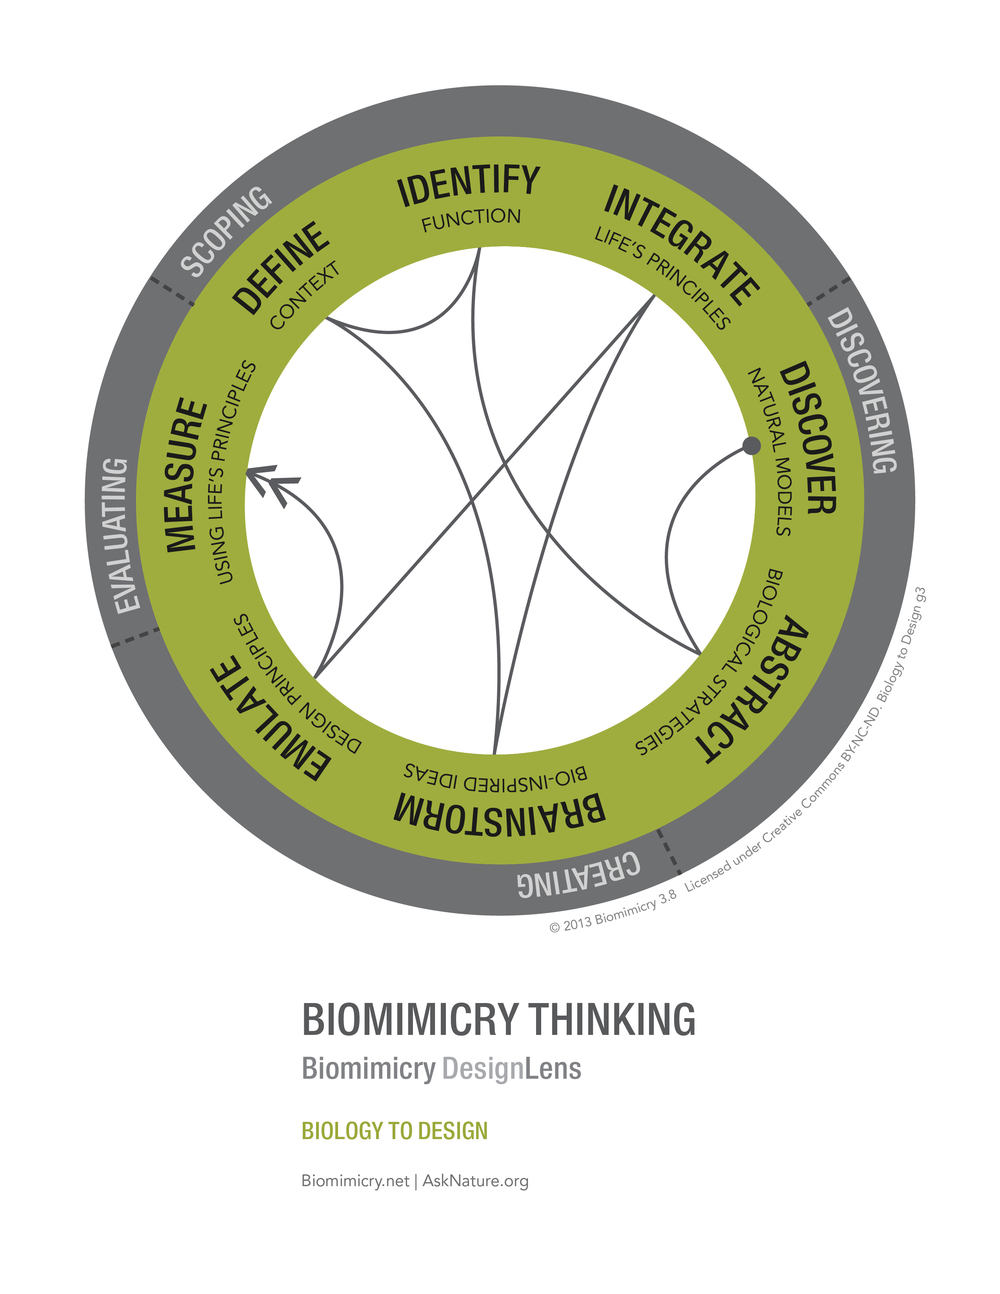 Biomimicry38_DesignLens_Biology_to_Design_WEB.jpg